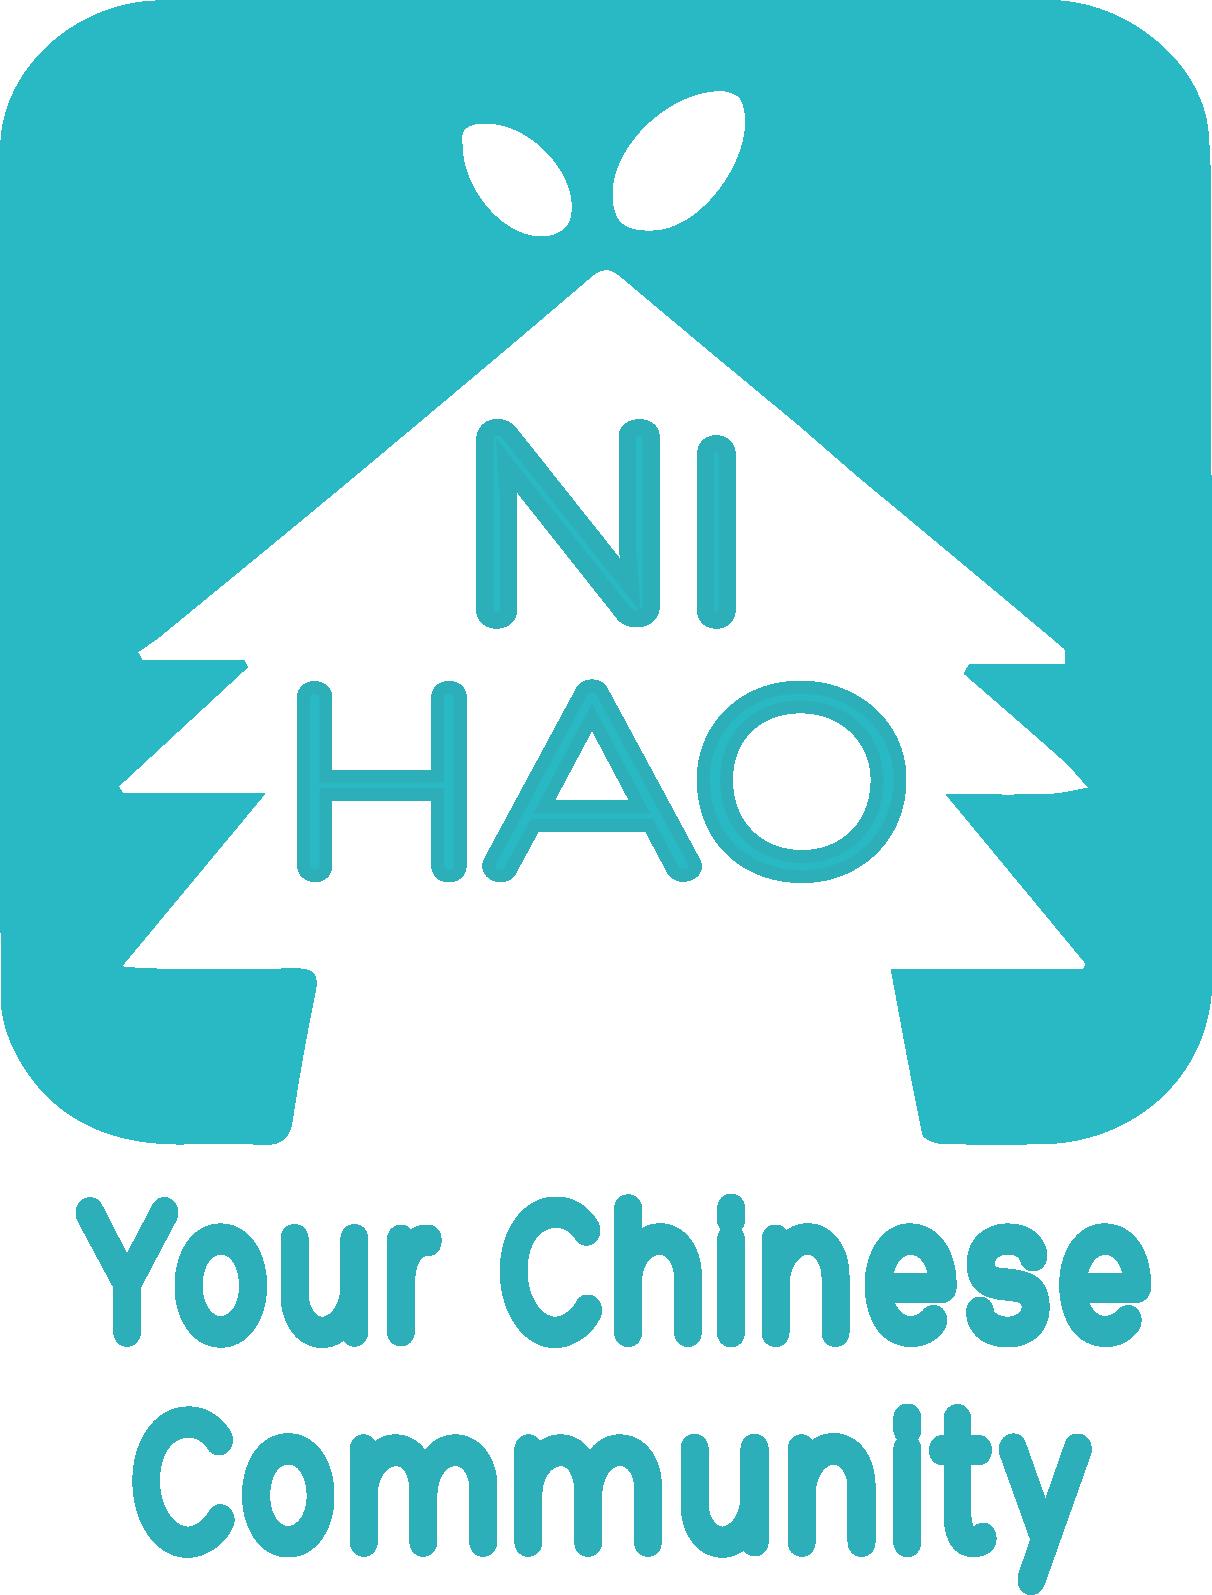 Ni Hao Chinese